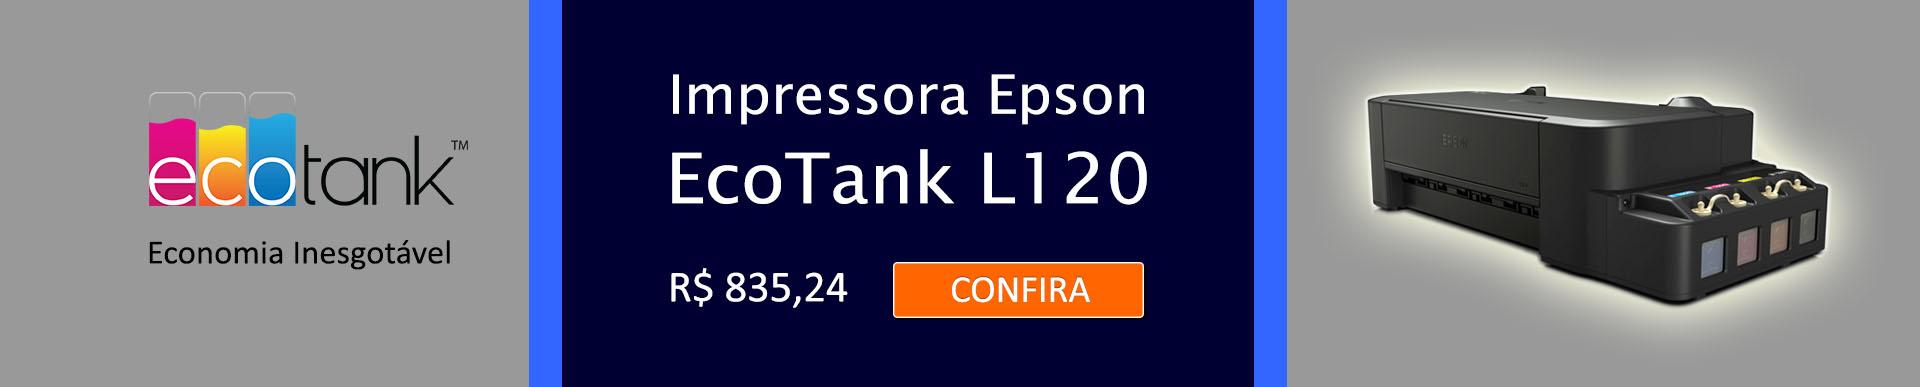 Impressora Epson EcoTankL120